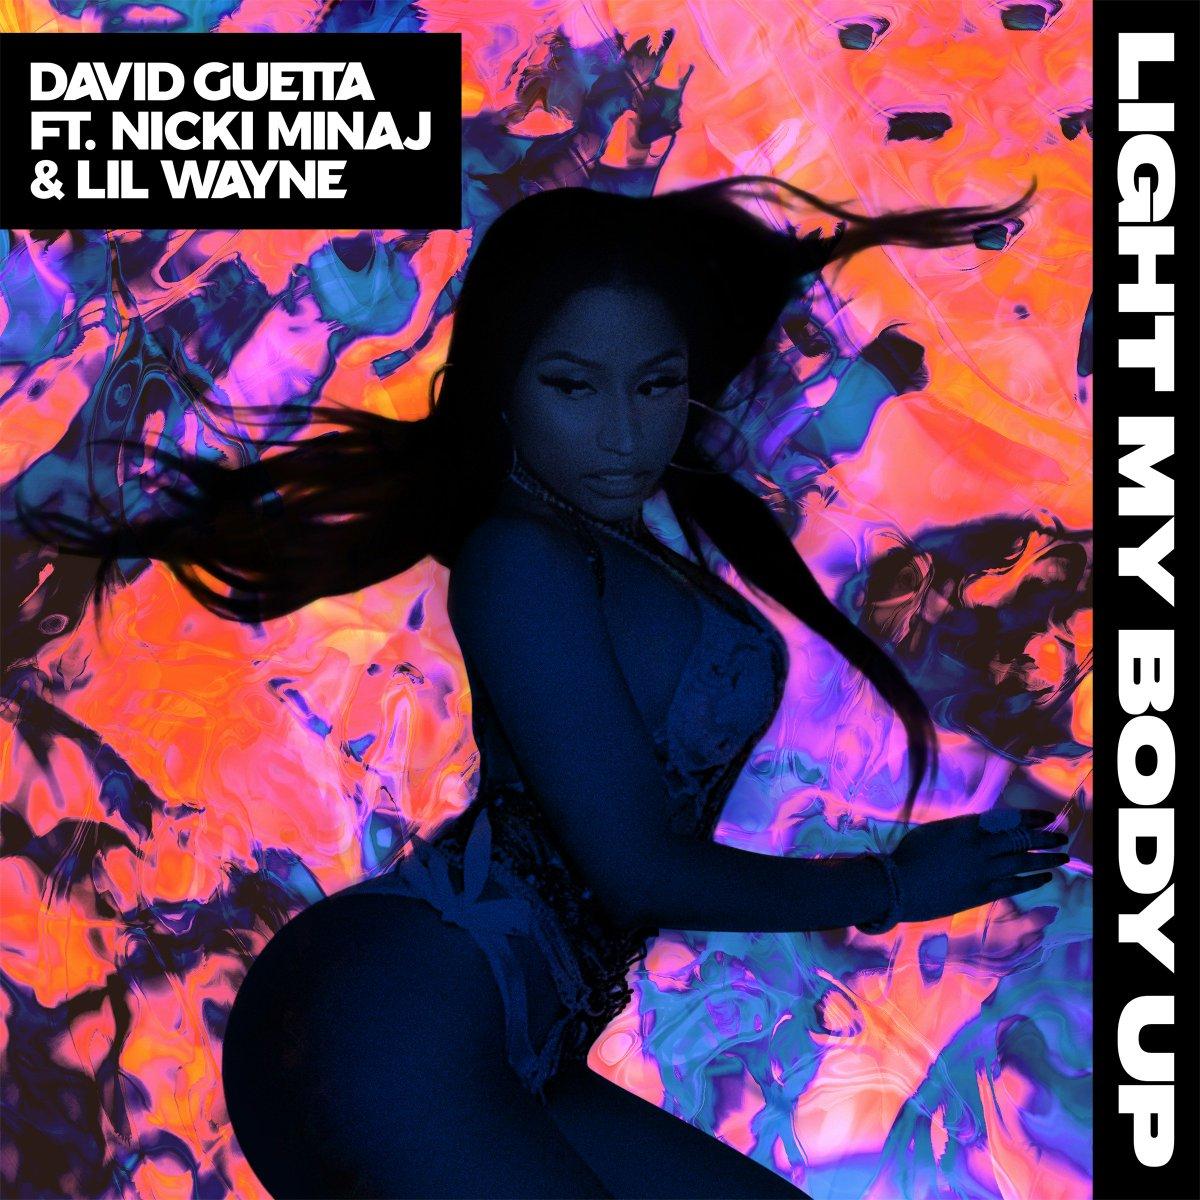 🔥🔥🔥 My new single 'LIGHT MY BODY UP' feat. @NICKIMINAJ & @LilTunec...